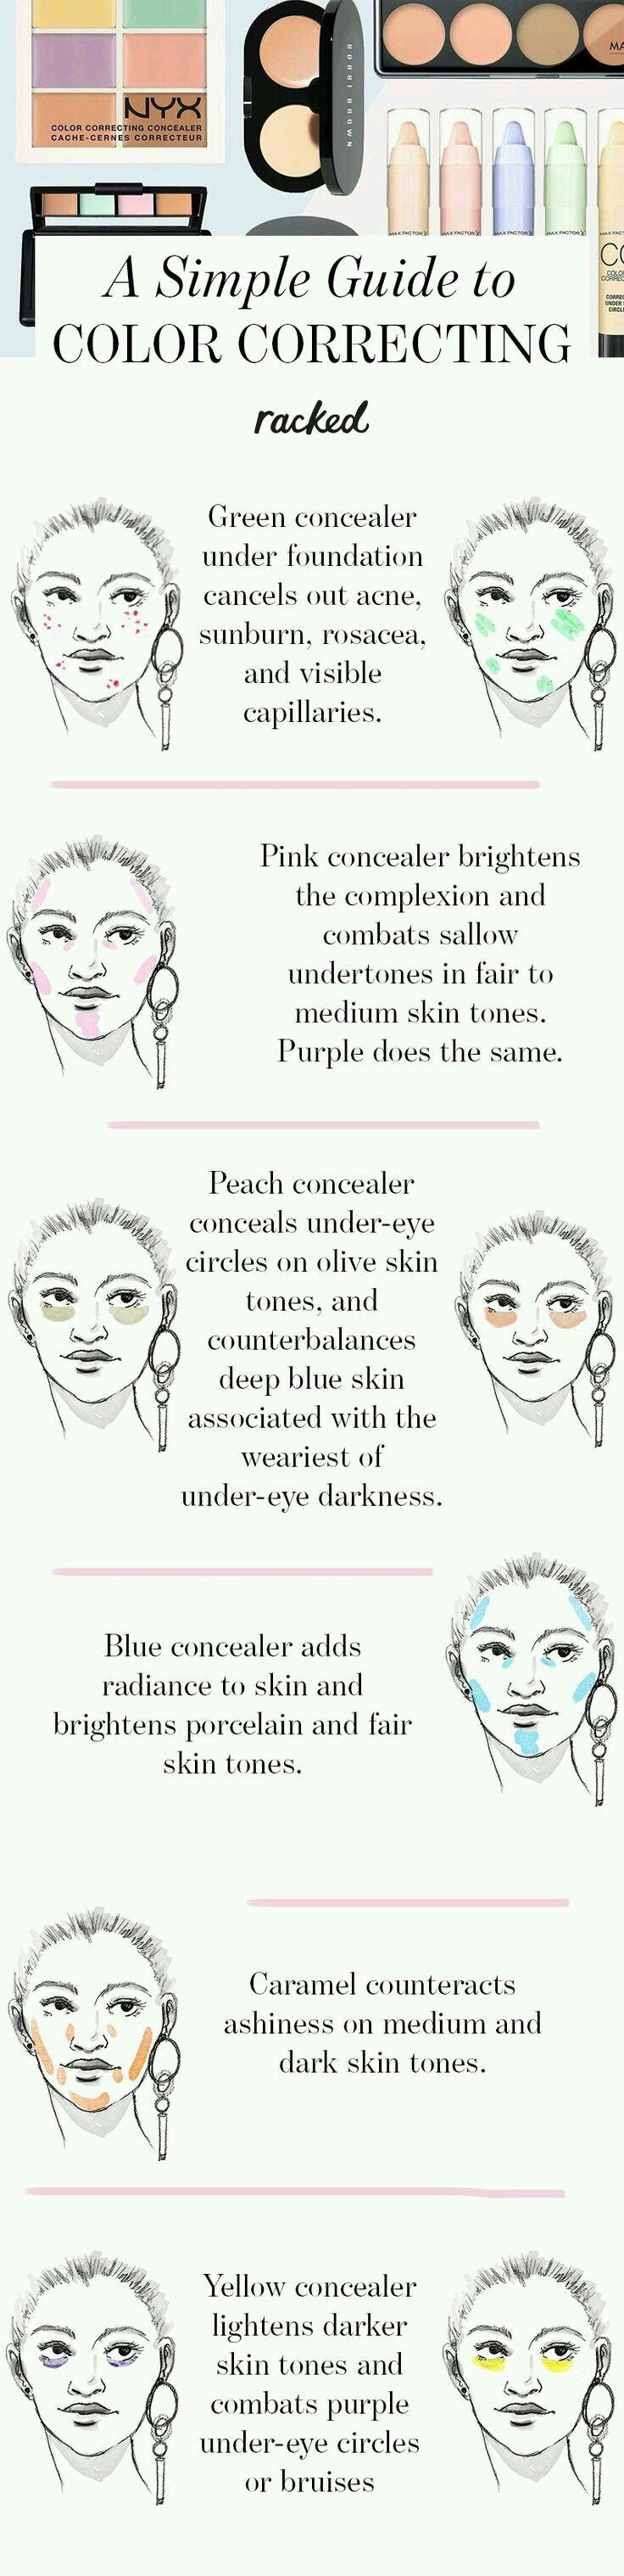 Color correcting makeup tips